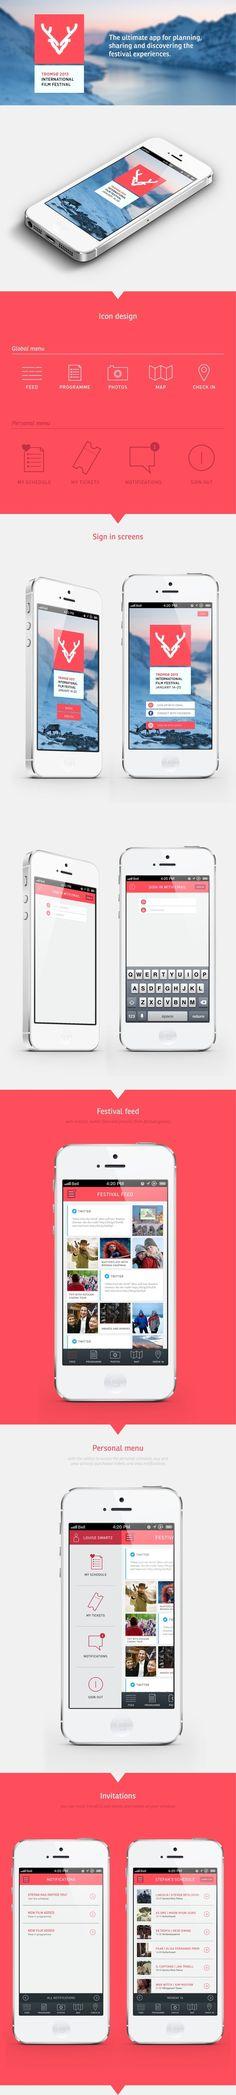 Inspiration Mobile #6 : Ergonomies et design | Blog du Webdesign